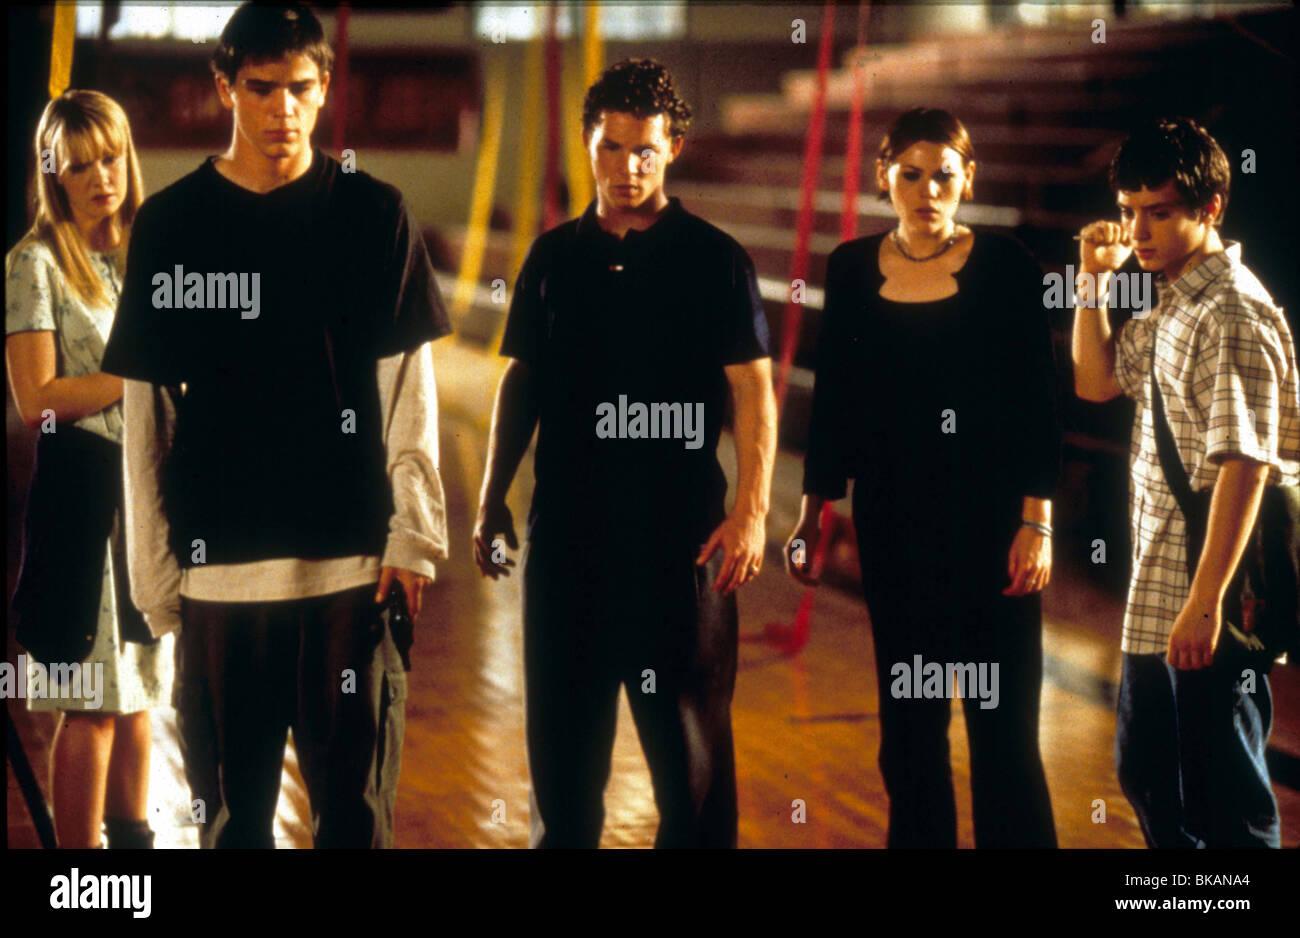 THE FACULTY (1999) LAURA HARRIS, JOSH HARTNETT, SHAWN HATOSY, CLEA DU VALL, ELIJAH WOOD FACU 018 - Stock Image